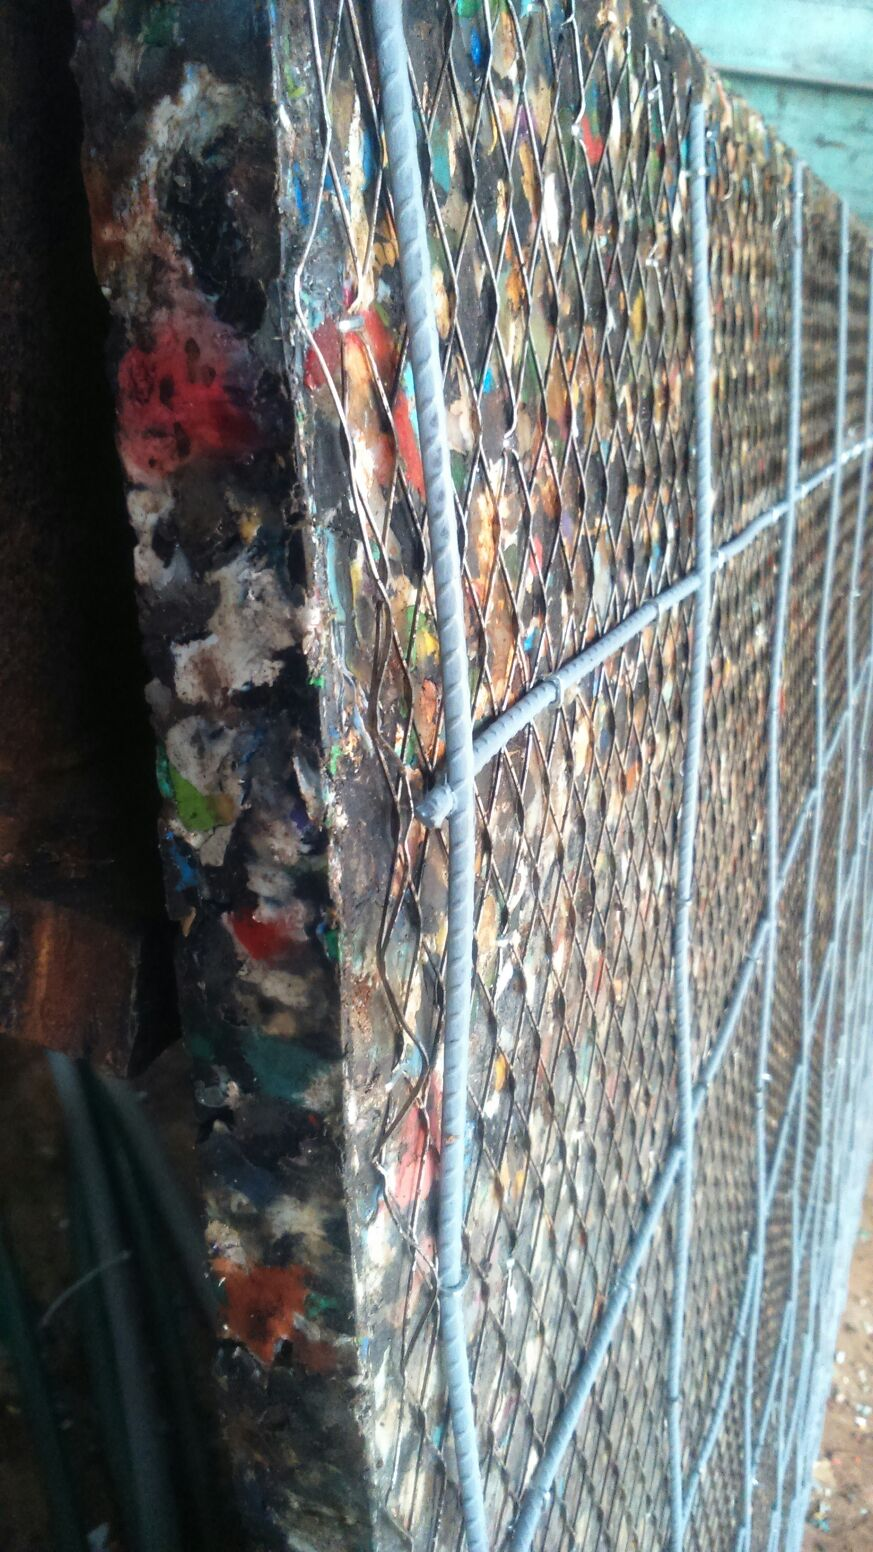 Mexico plastic EcoDom